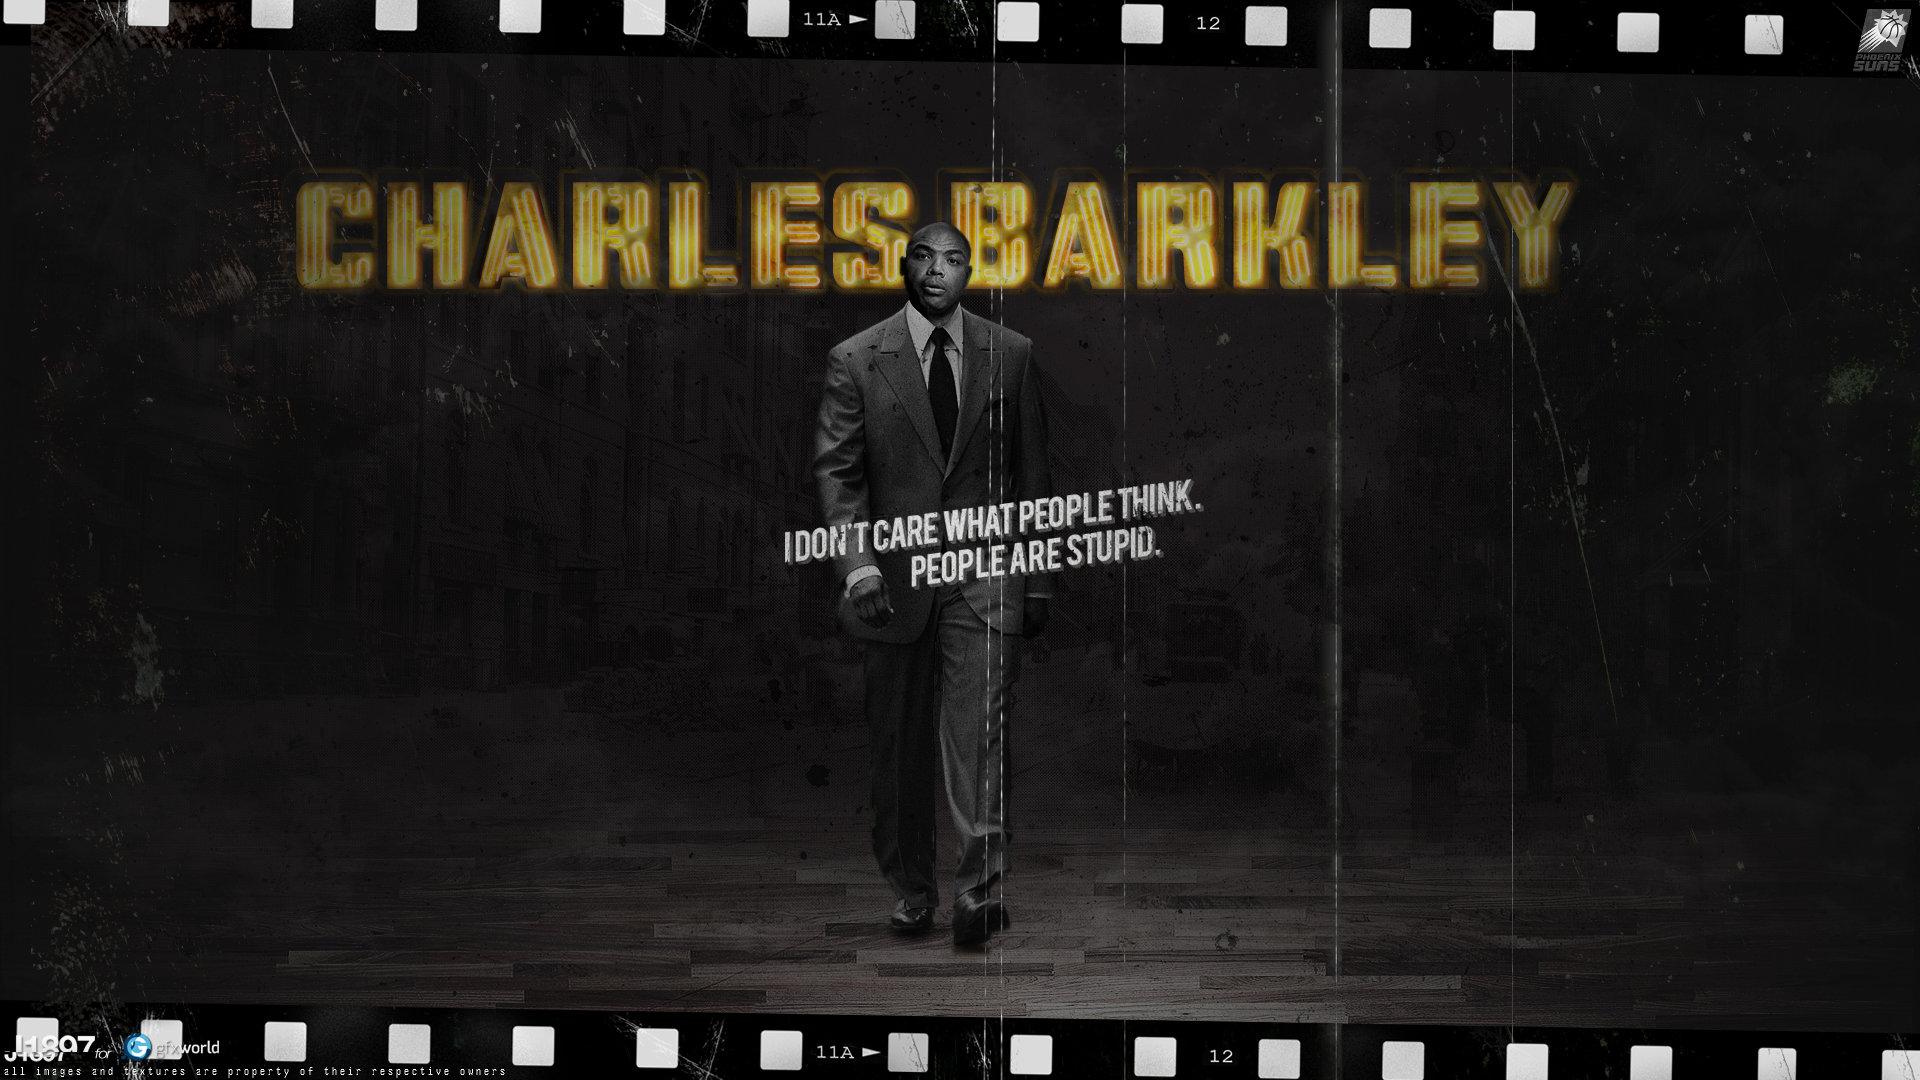 Charles Barkley Basketball Wallpapers | Charles Barkley NBA ...